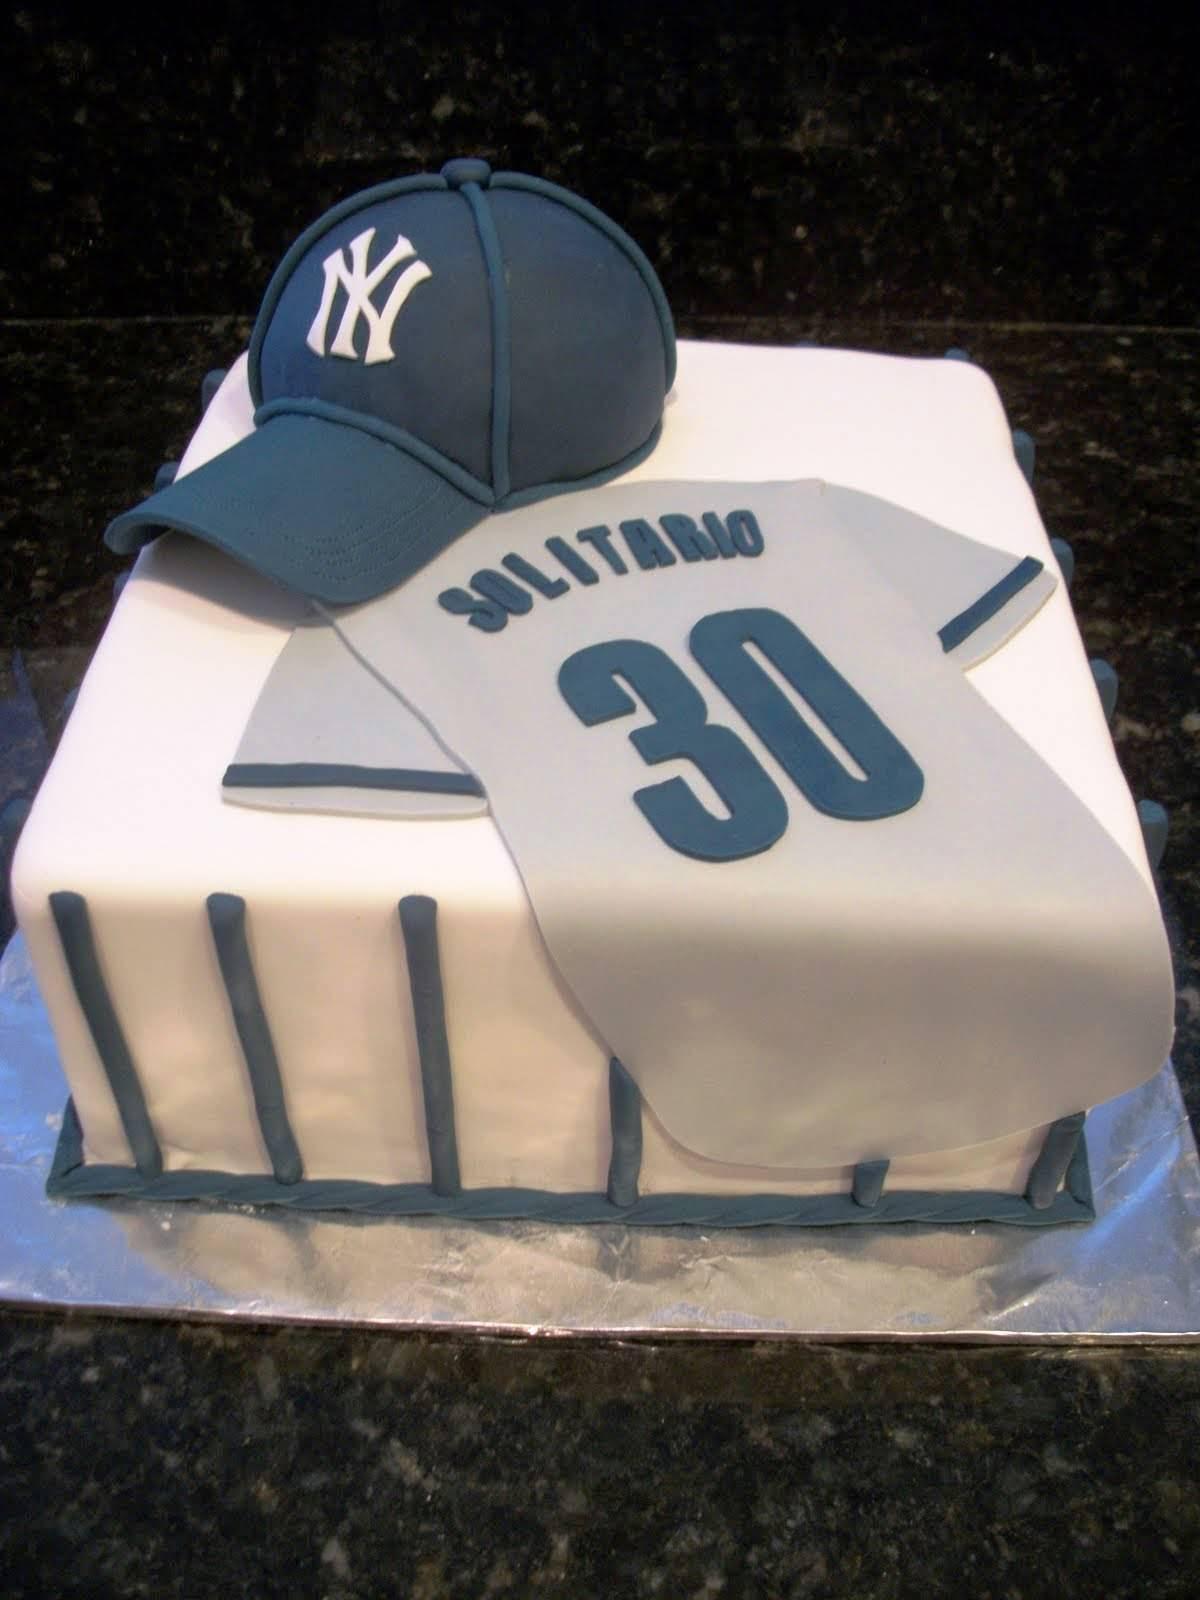 30th birthday cakes male google search 30th birthday